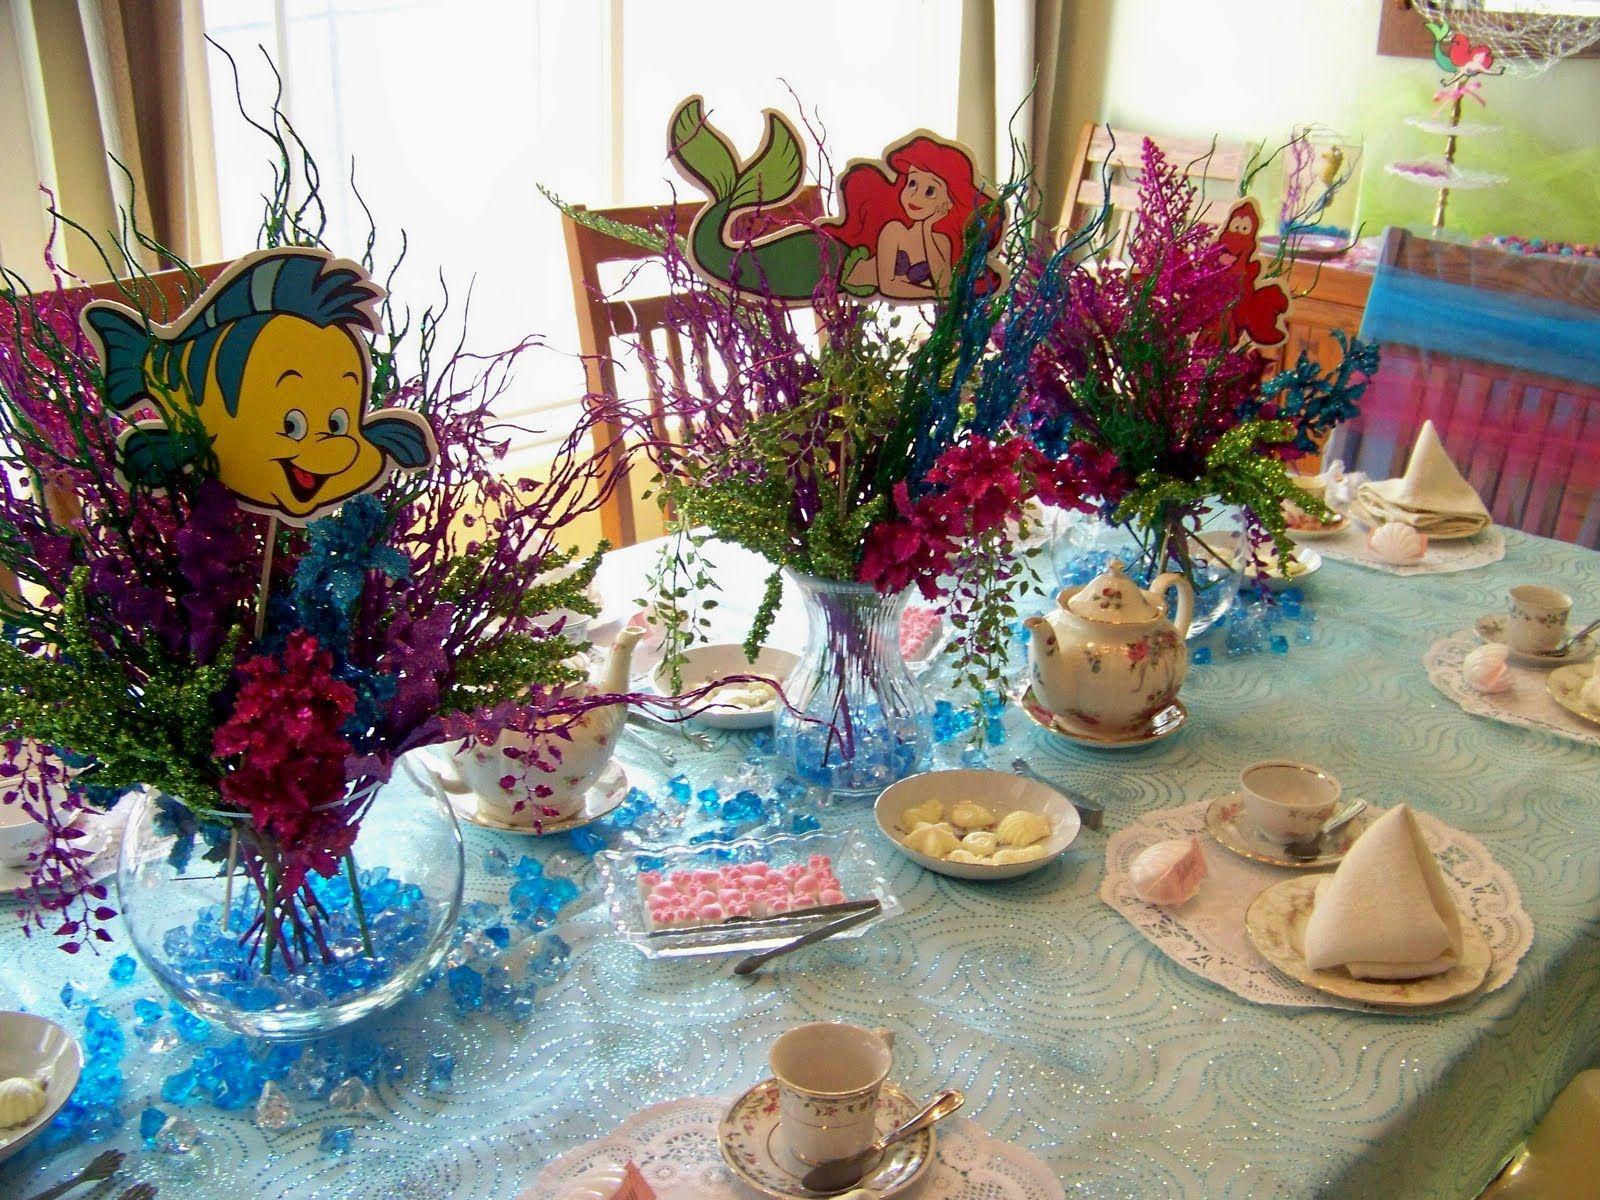 little mermaid centerpieces ideas plumeria cake studio under the sea tea party party. Black Bedroom Furniture Sets. Home Design Ideas